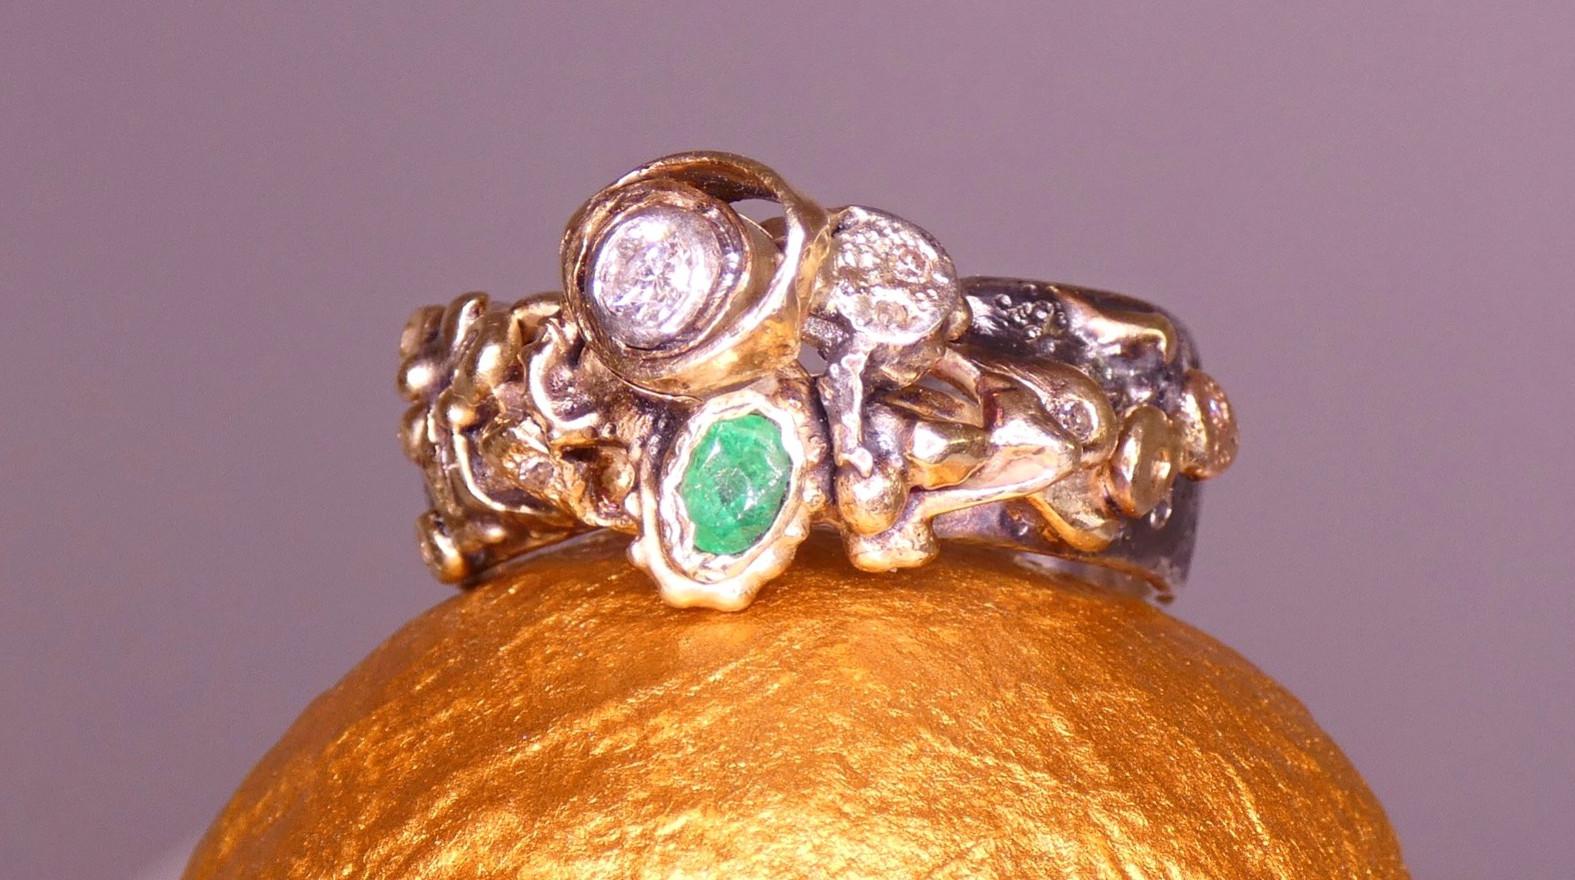 Commission Piece - Gold, silver, diamonds & emerald